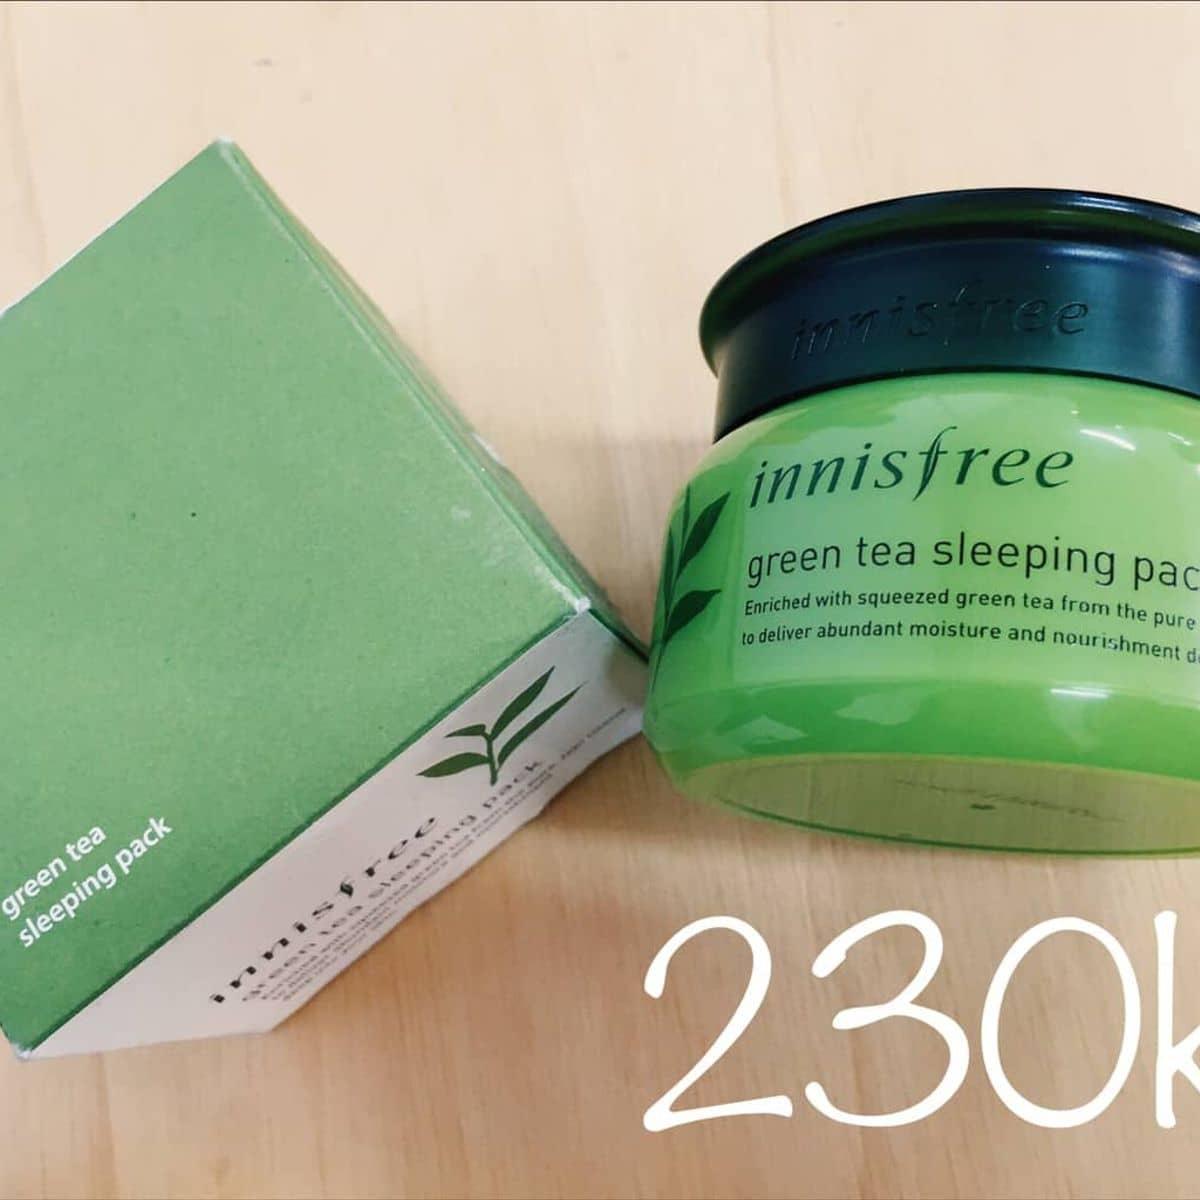 Mt N Ng Tr Xanh Innisfree Green Tea Sleeping Pack Ti Tphcm Ca Pun Nguyen Lozi